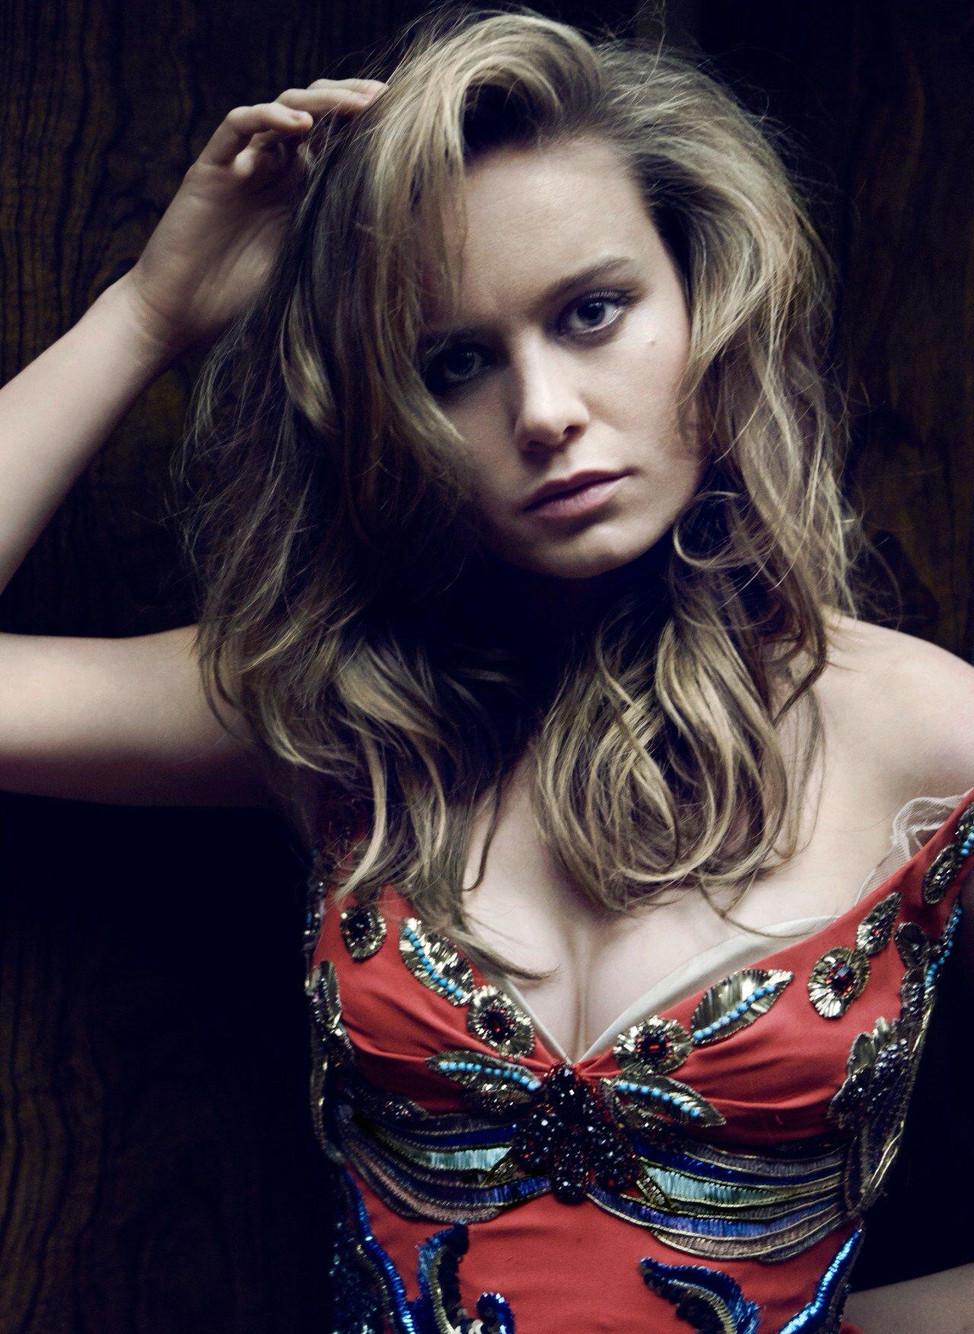 Brie Larson sexuales